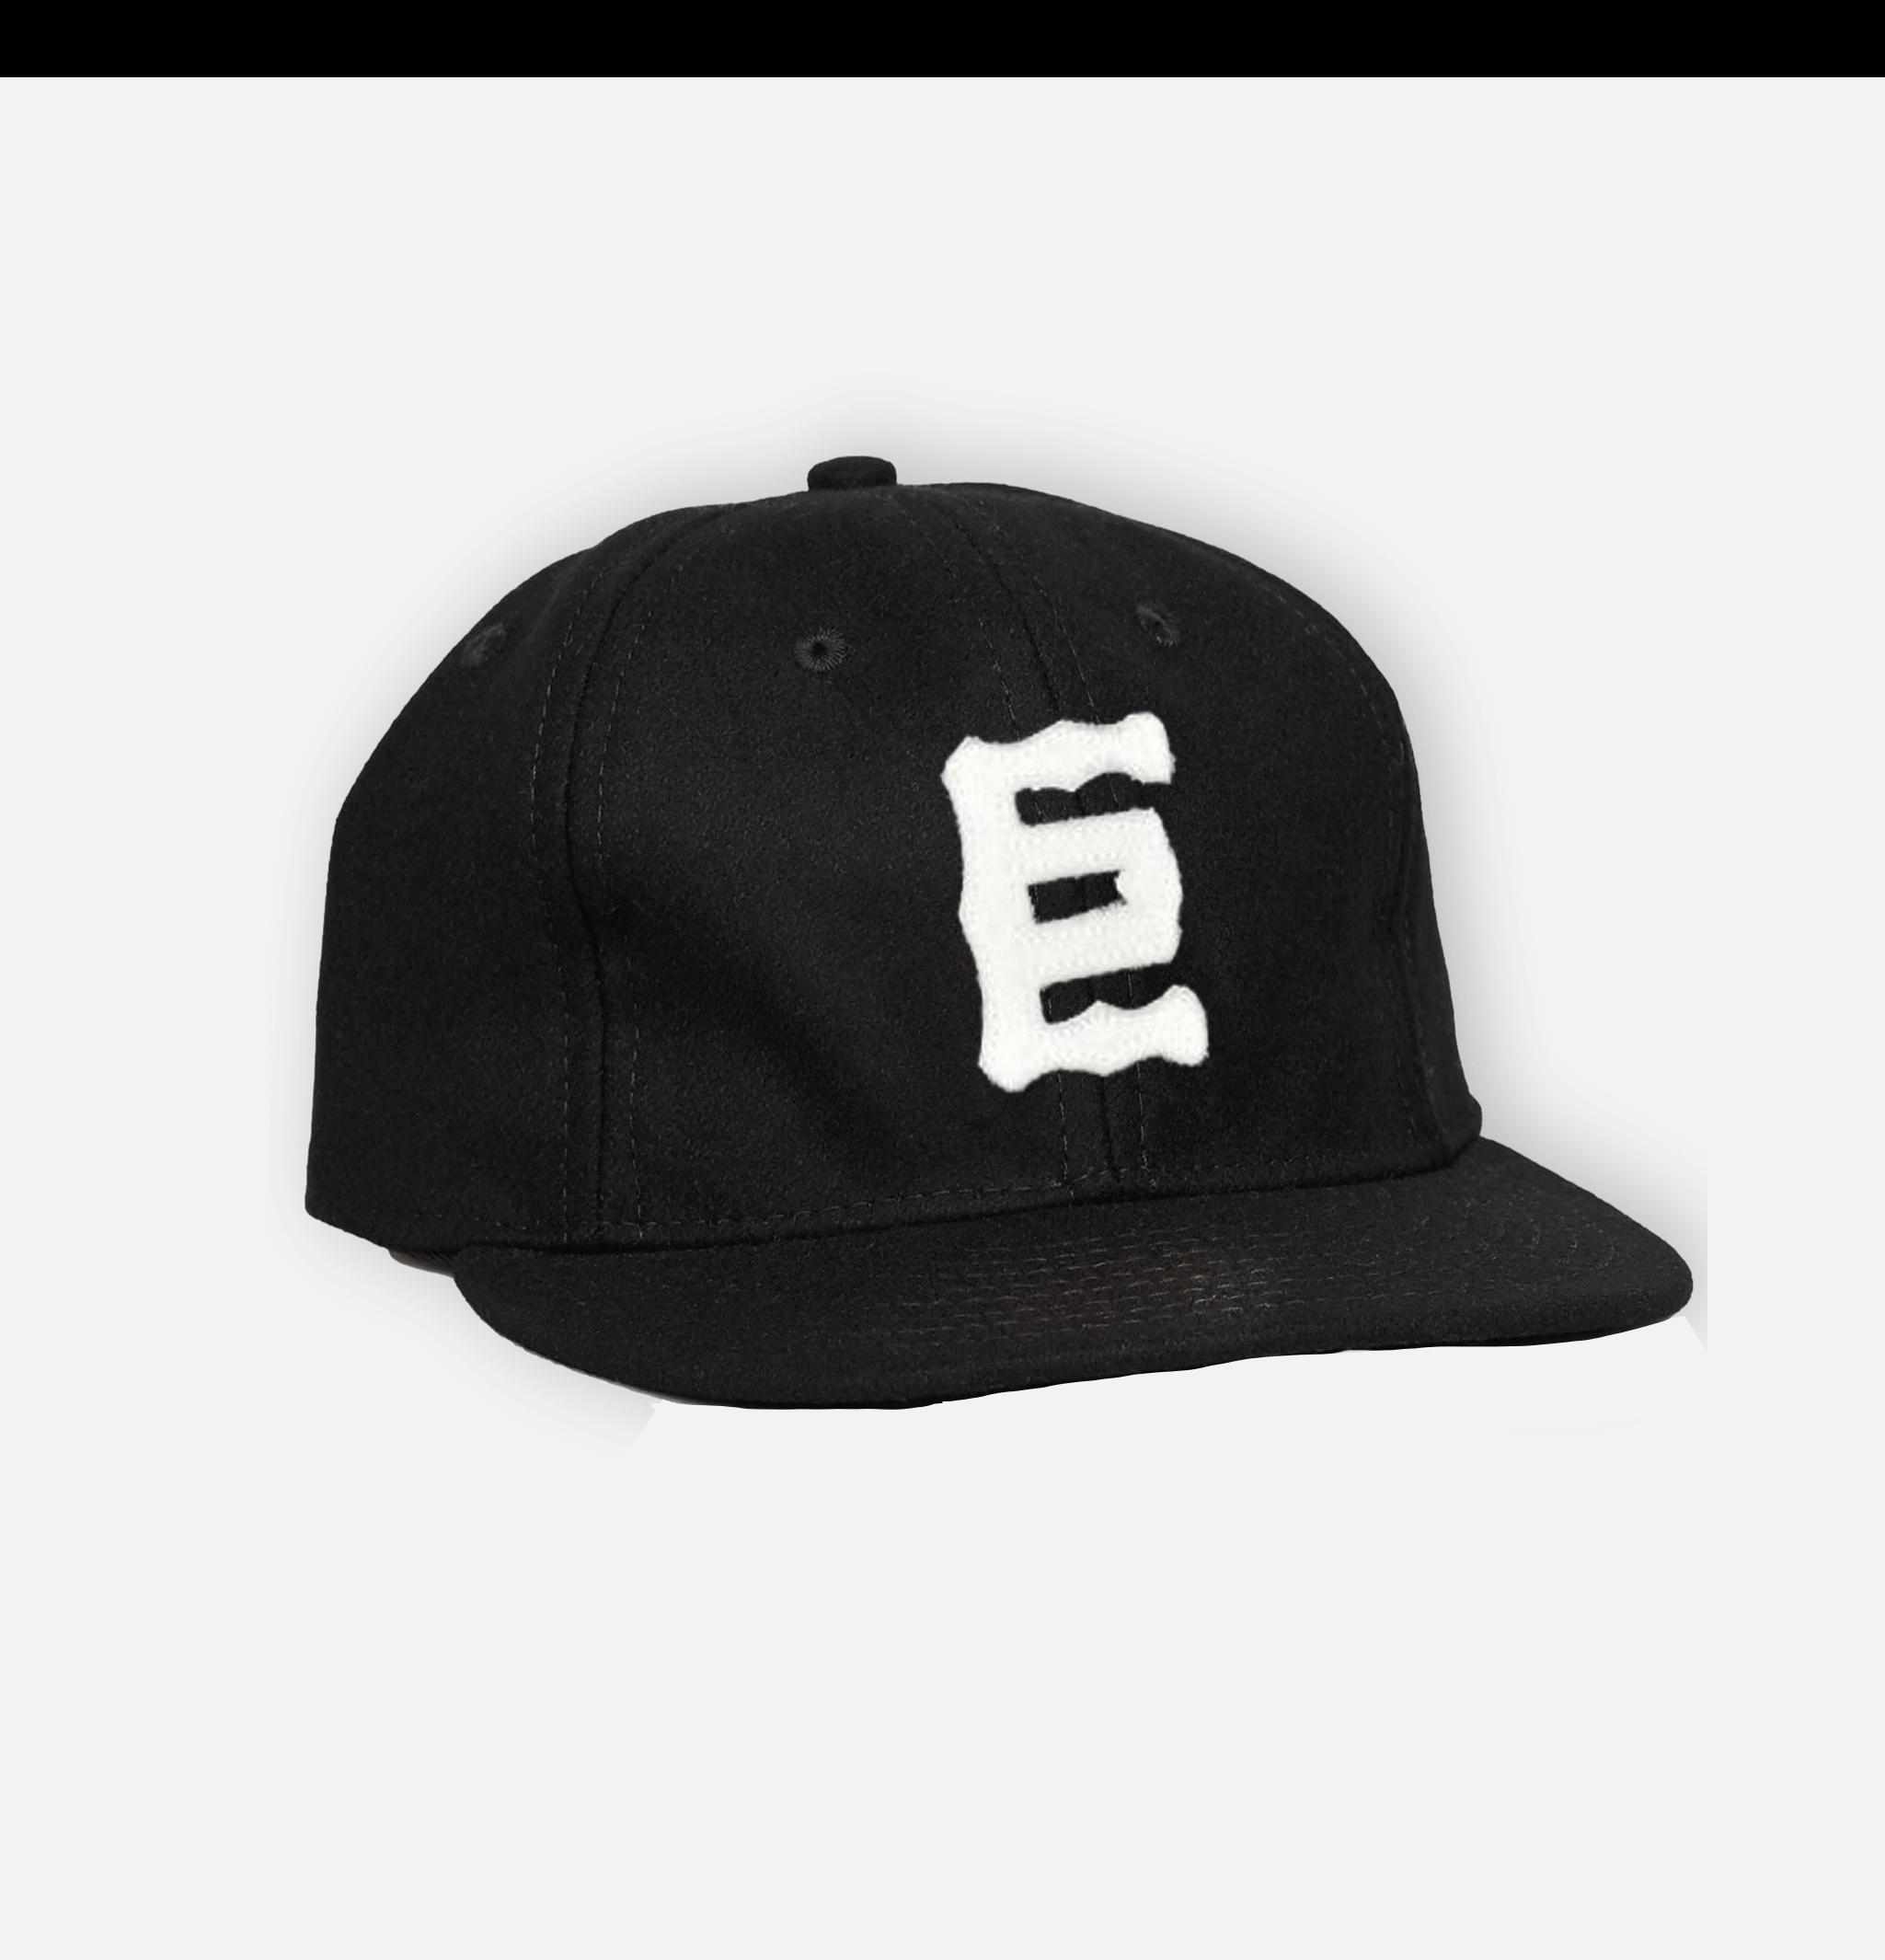 Tokyo Giants Ballcap Black